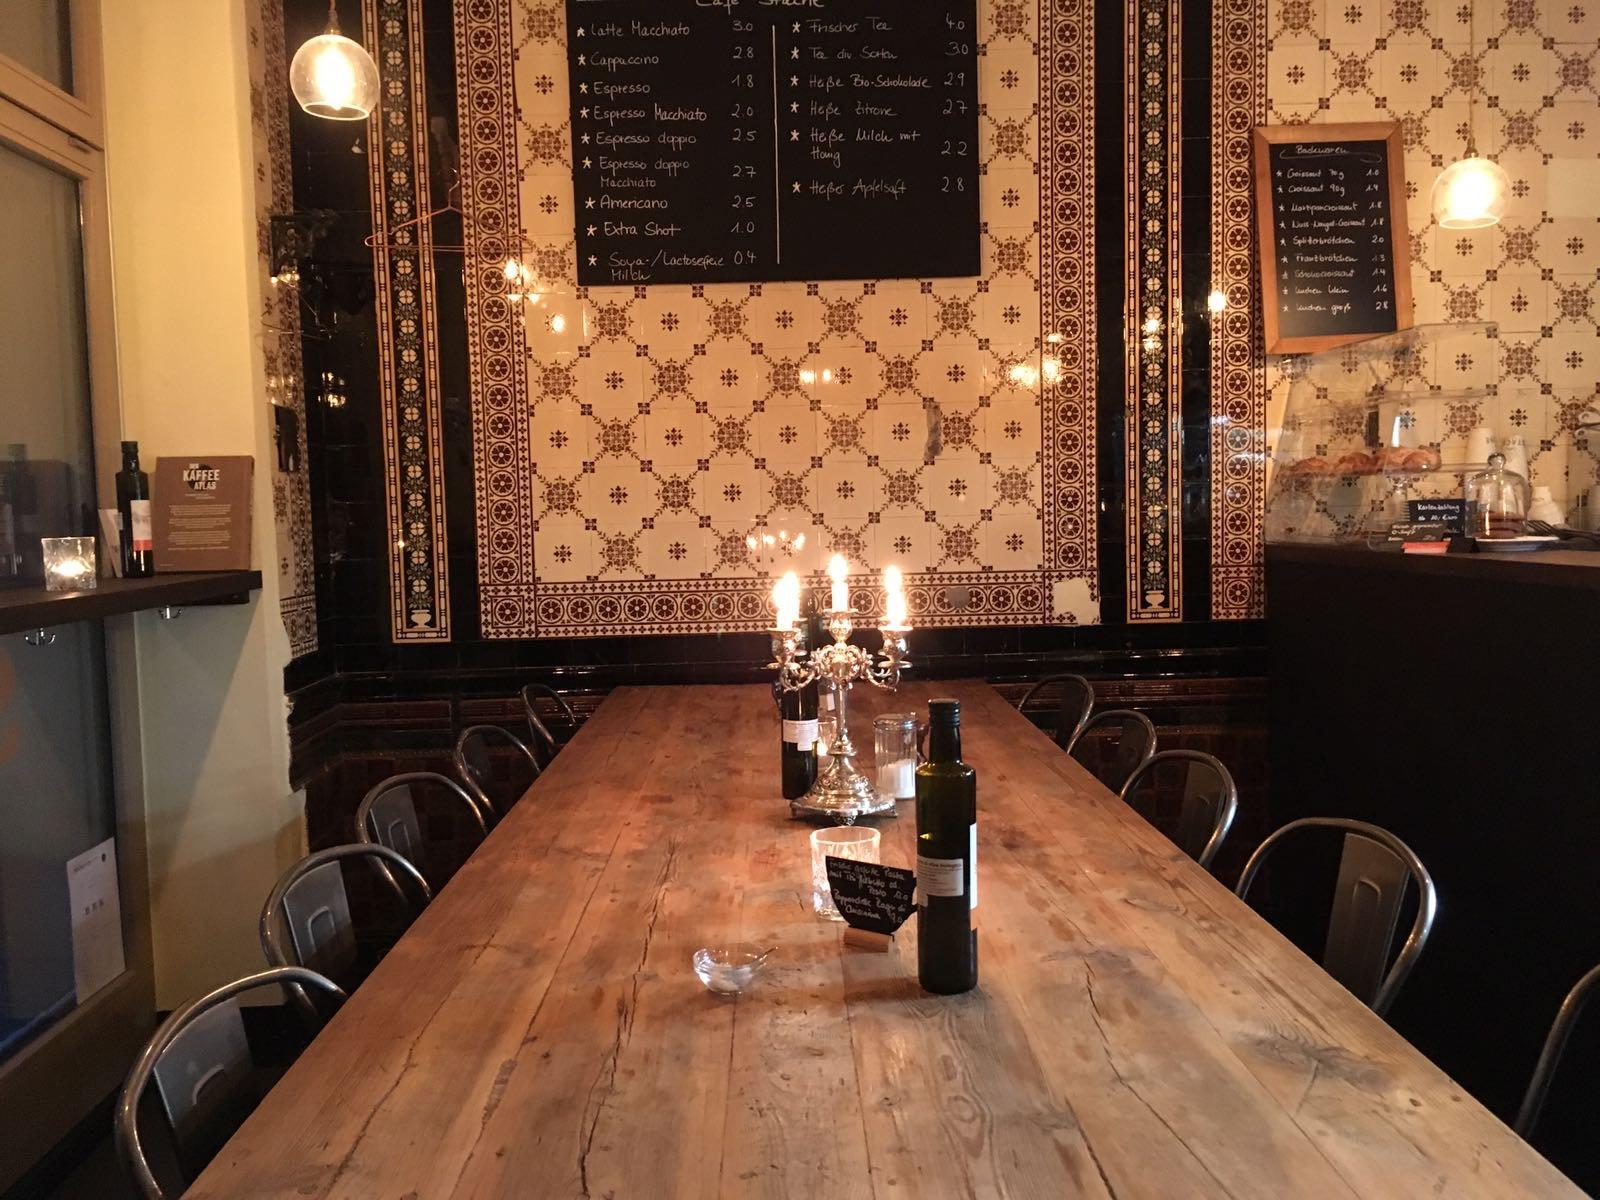 Cafe Stache Berlin